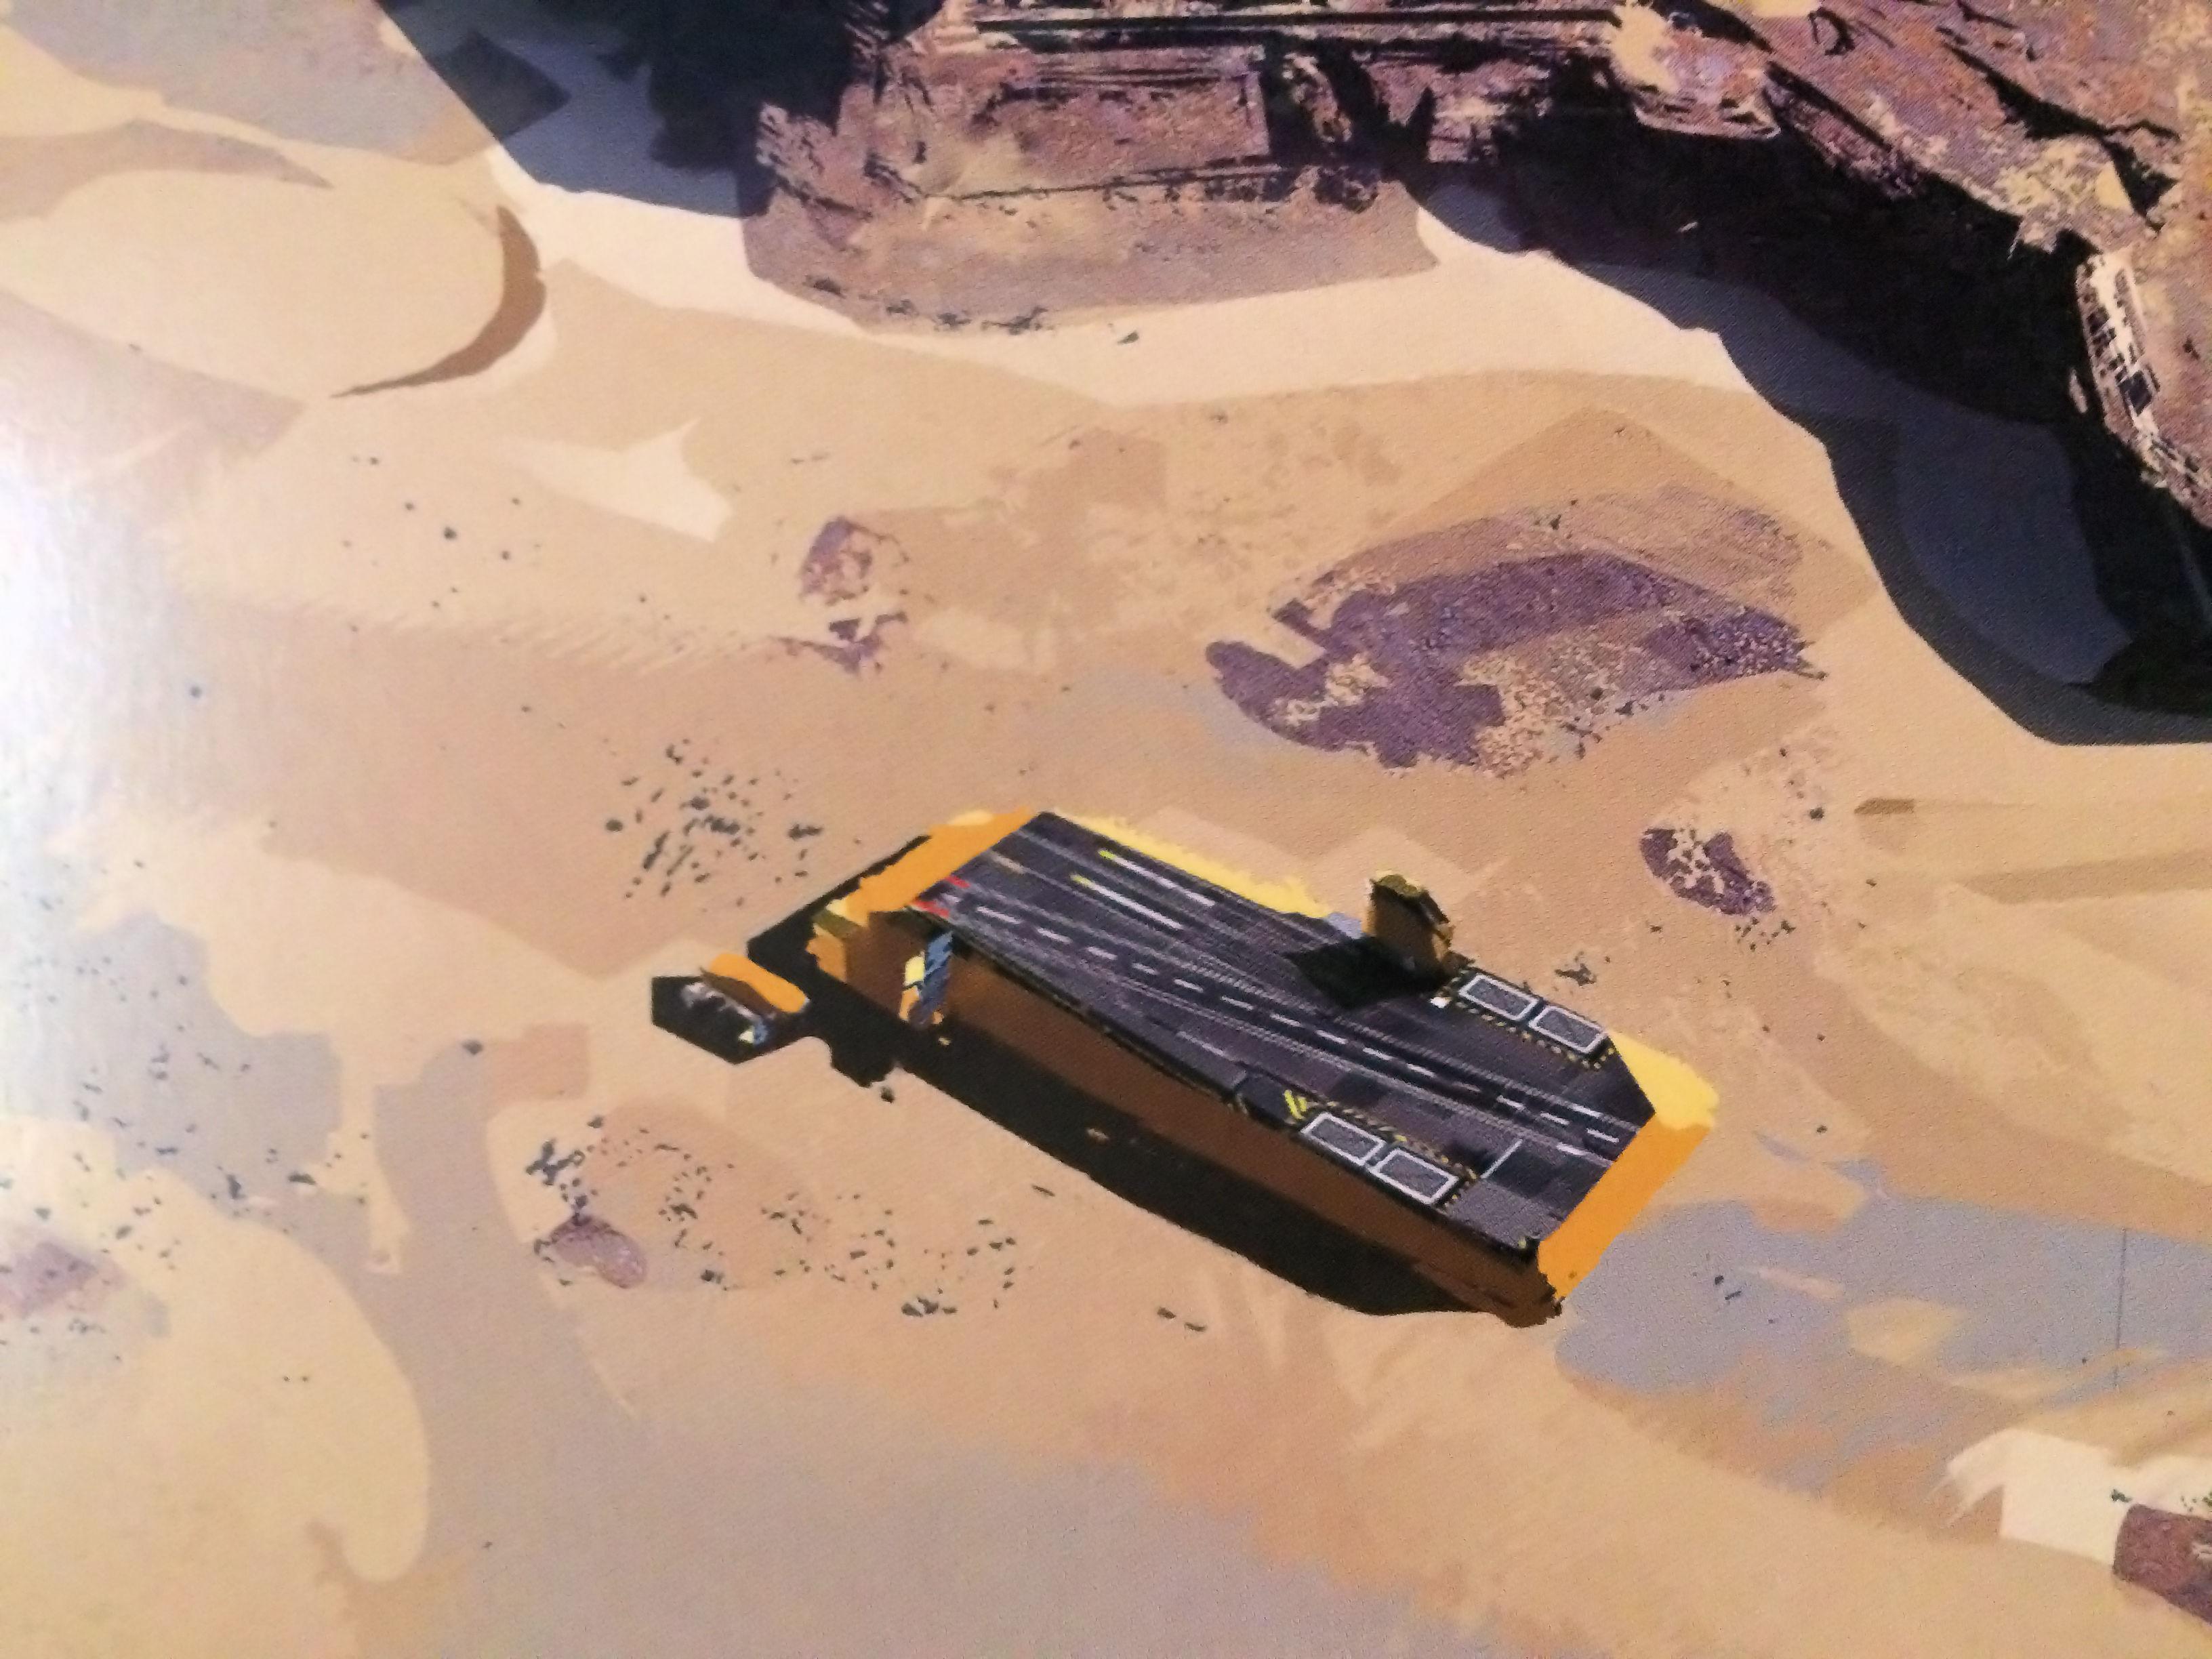 Homeworld Deserts of Kharak Collector's Edition Concept Art - Coalition Carrier